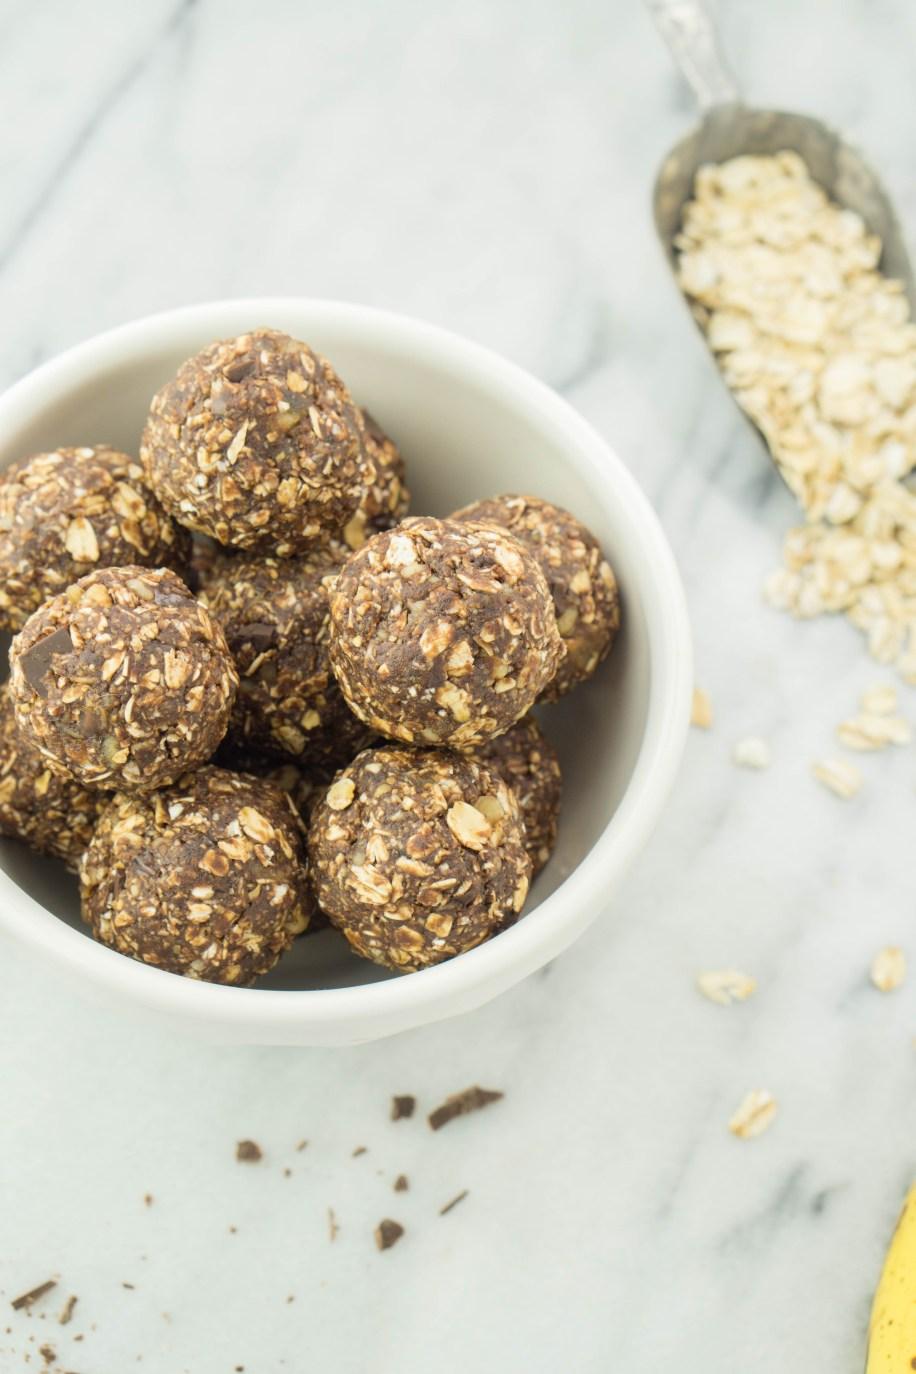 Chocolate Banana Energy Bites! #vegan #glutenfree #walnut #darkchocolate #dates #healthysnackideas   www.wakeuptowaffles.com